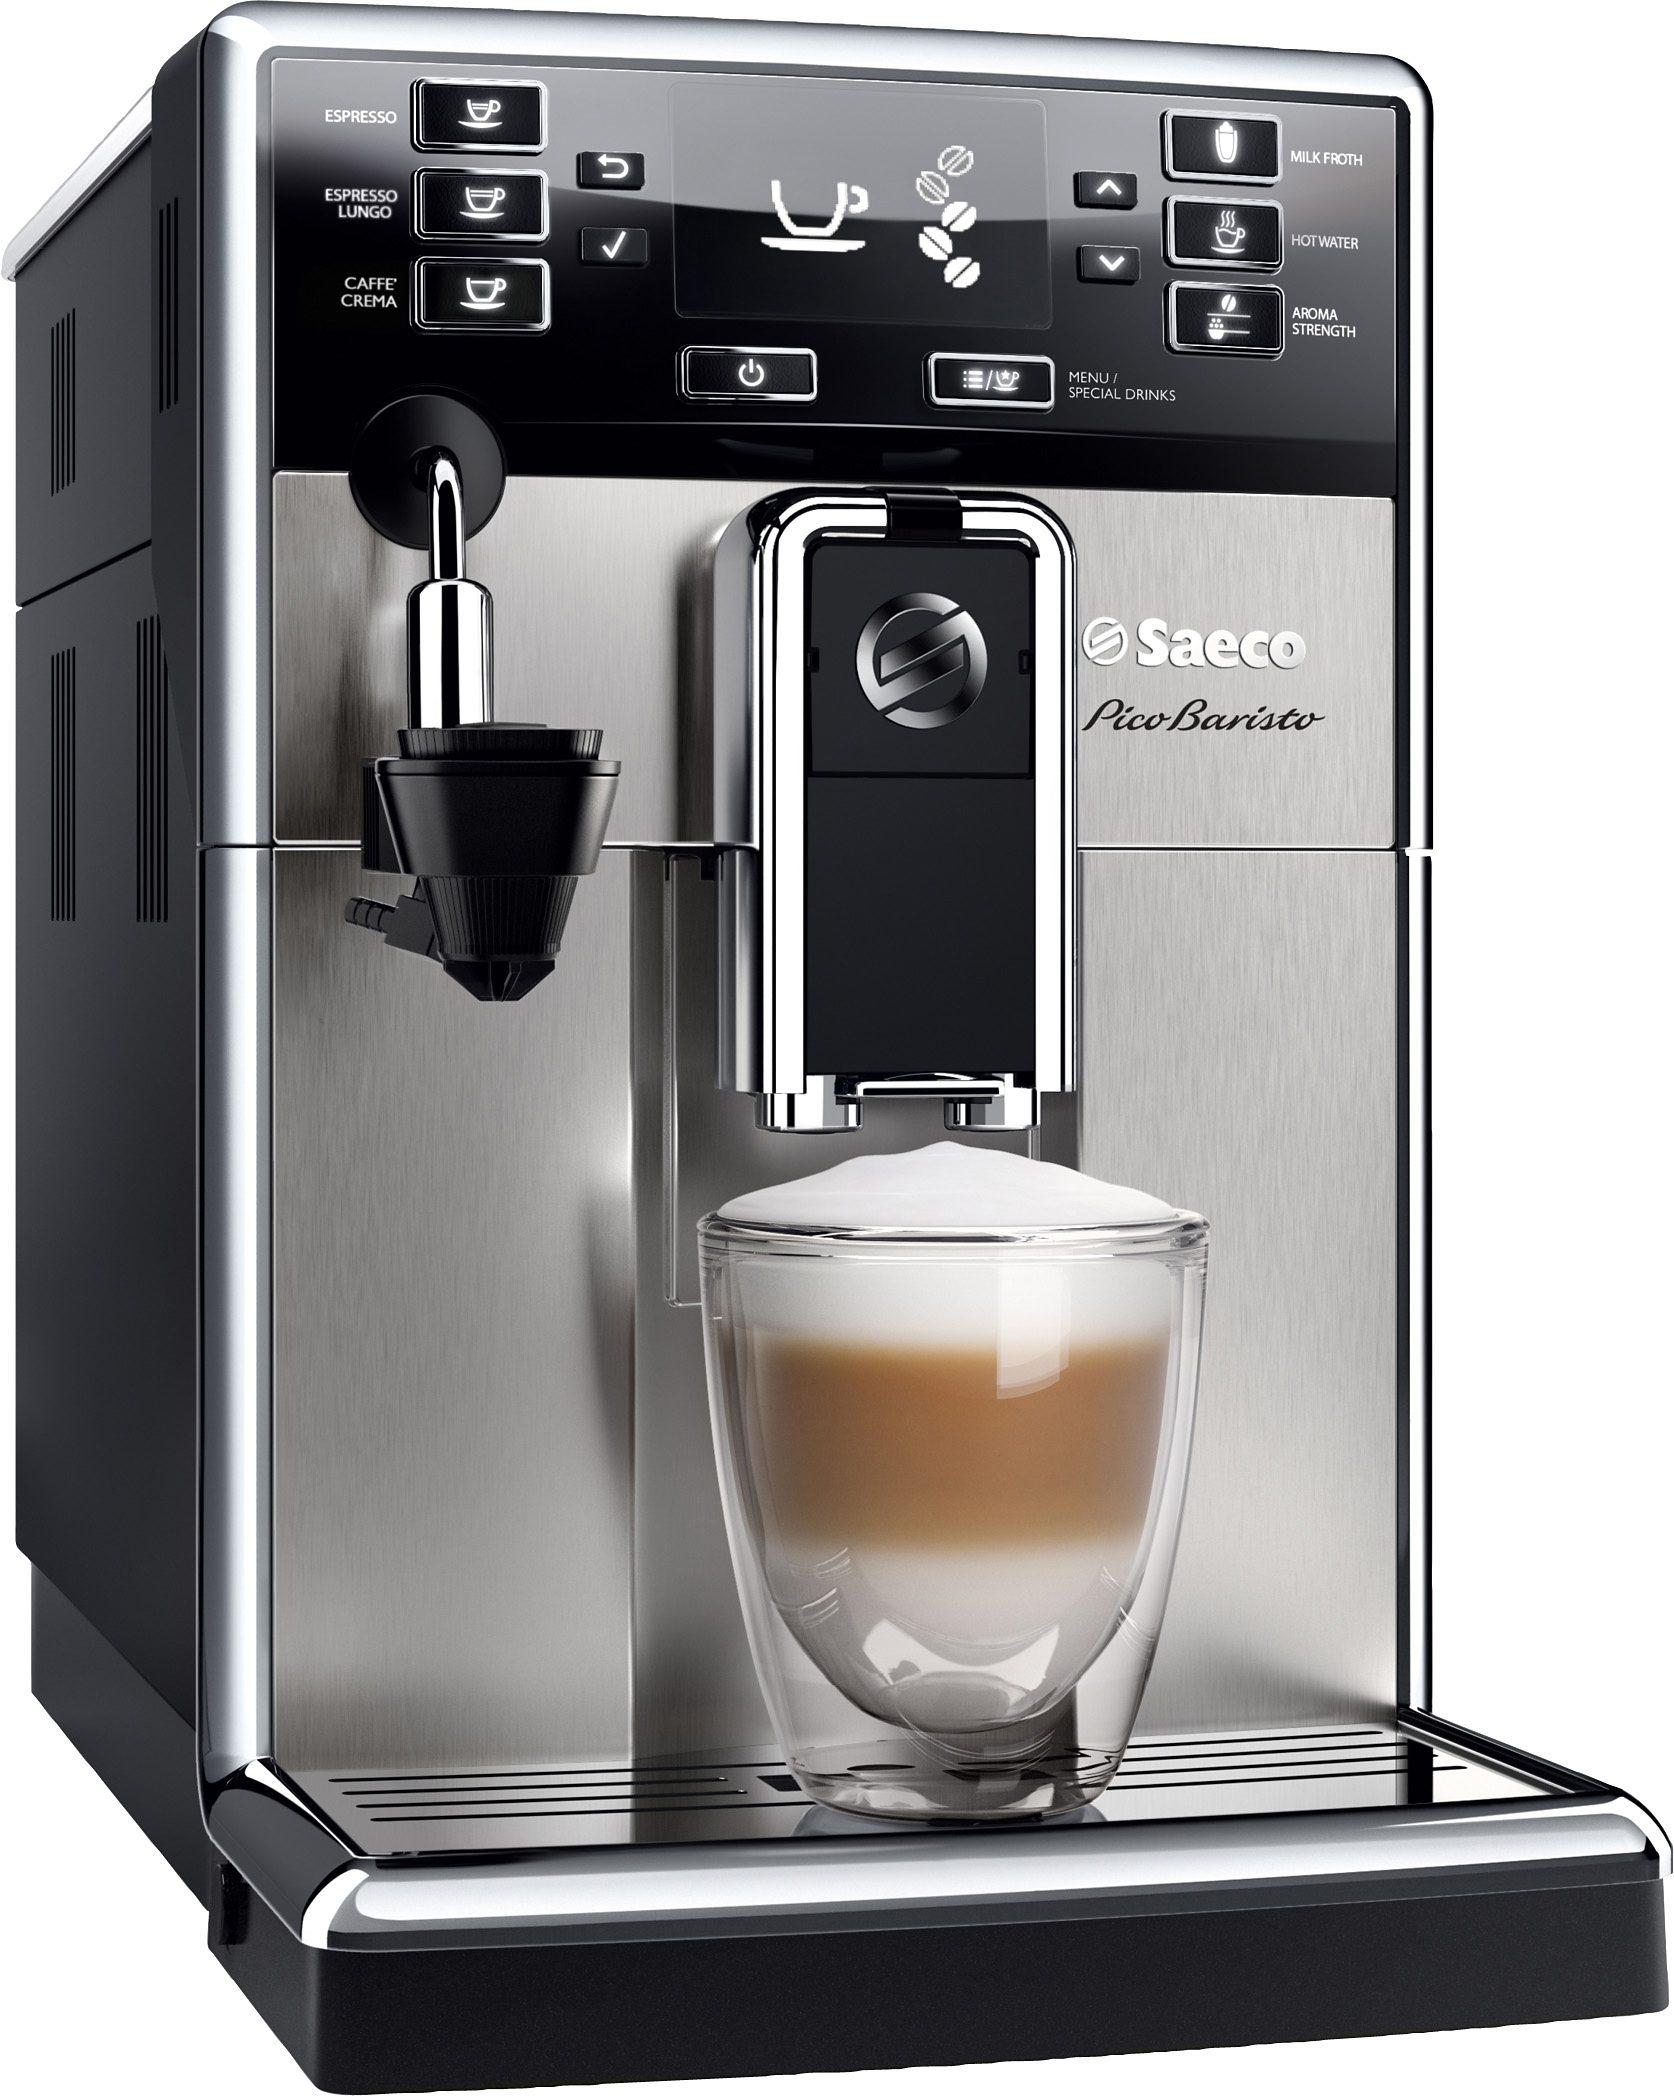 Saeco Kaffeevollautomat HD8924/01 PicoBaristo mit Cappuccinatore, edelstahl silber